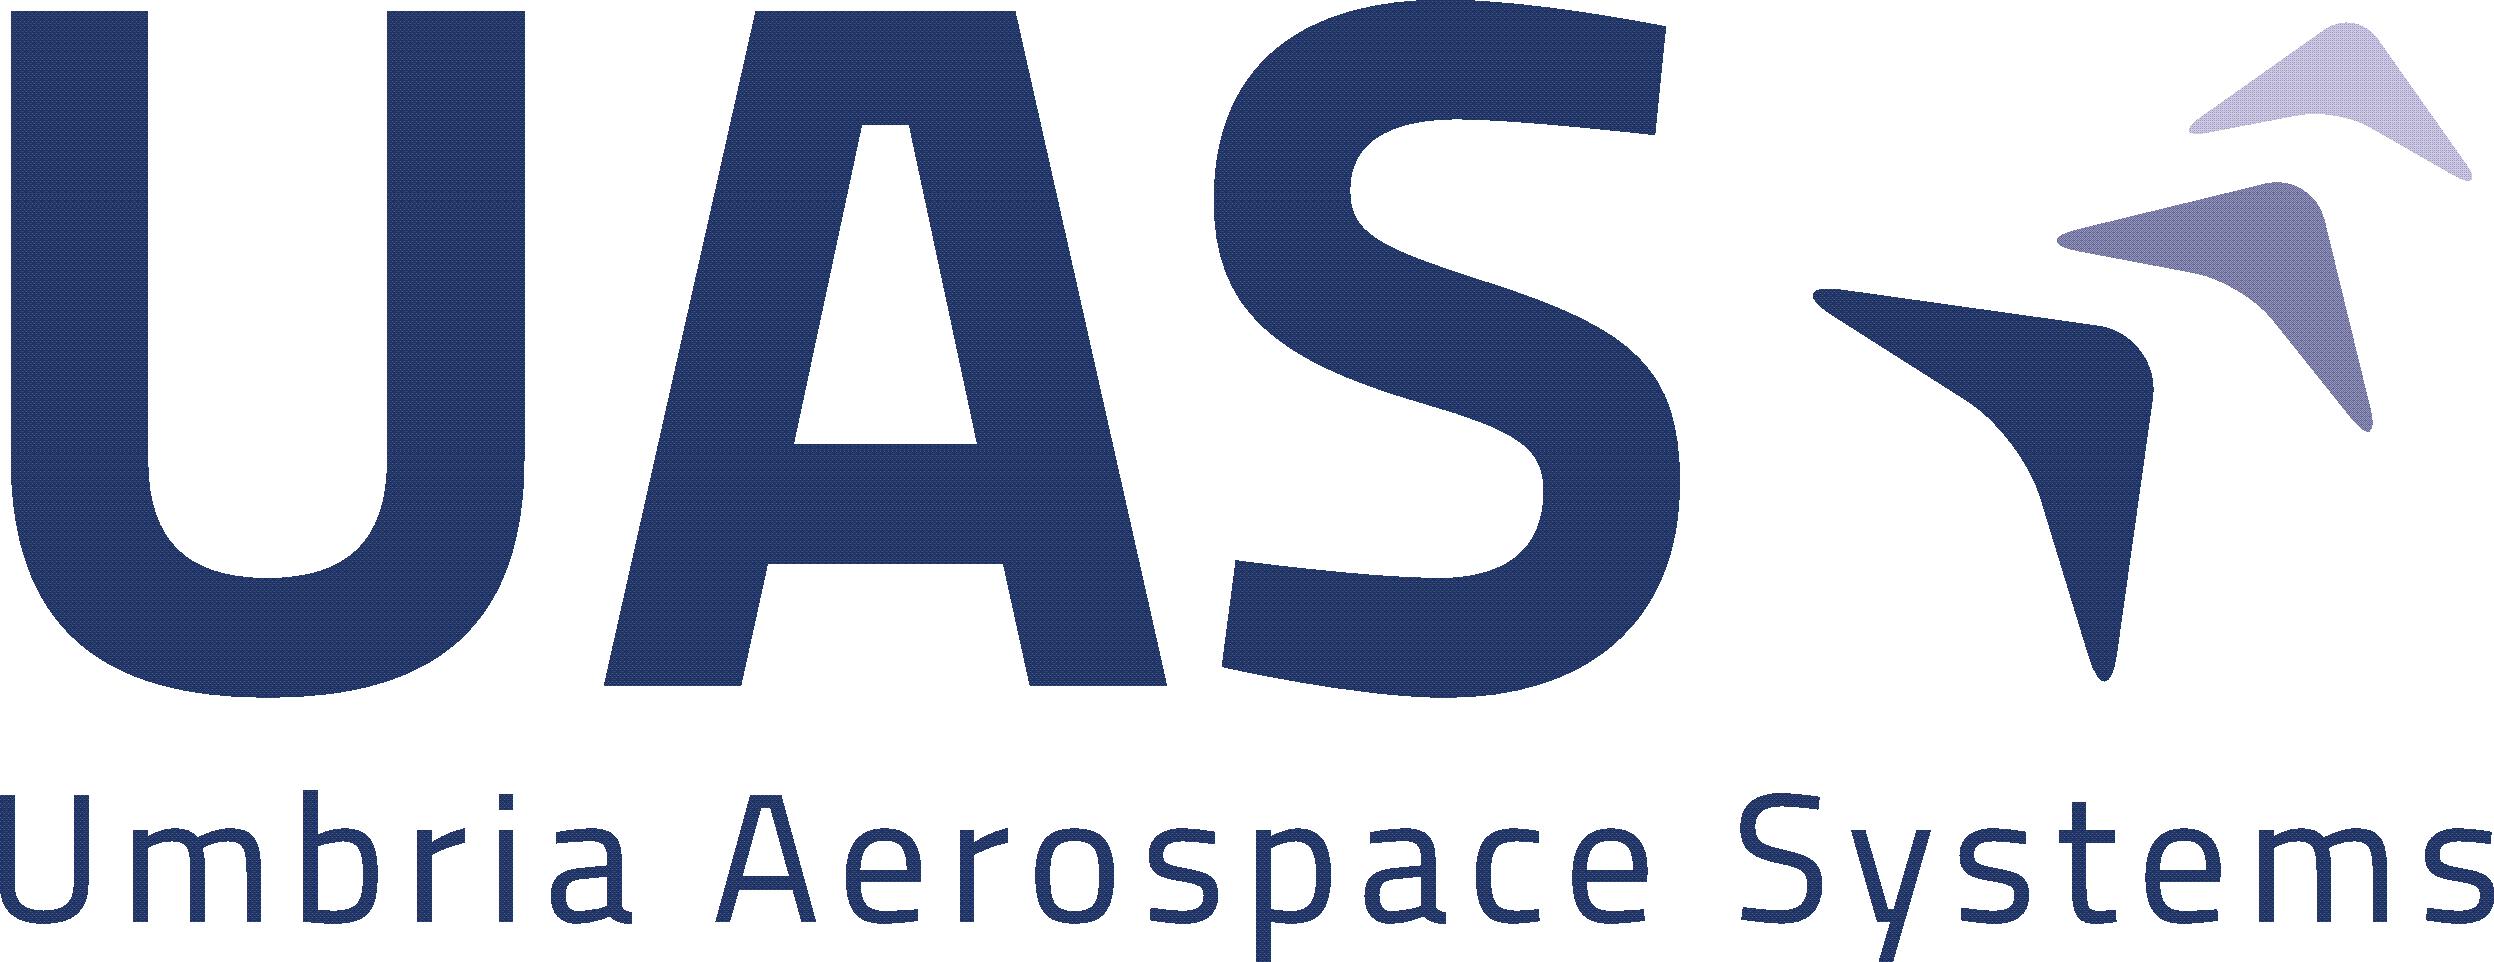 Umbria Aerospace Systems